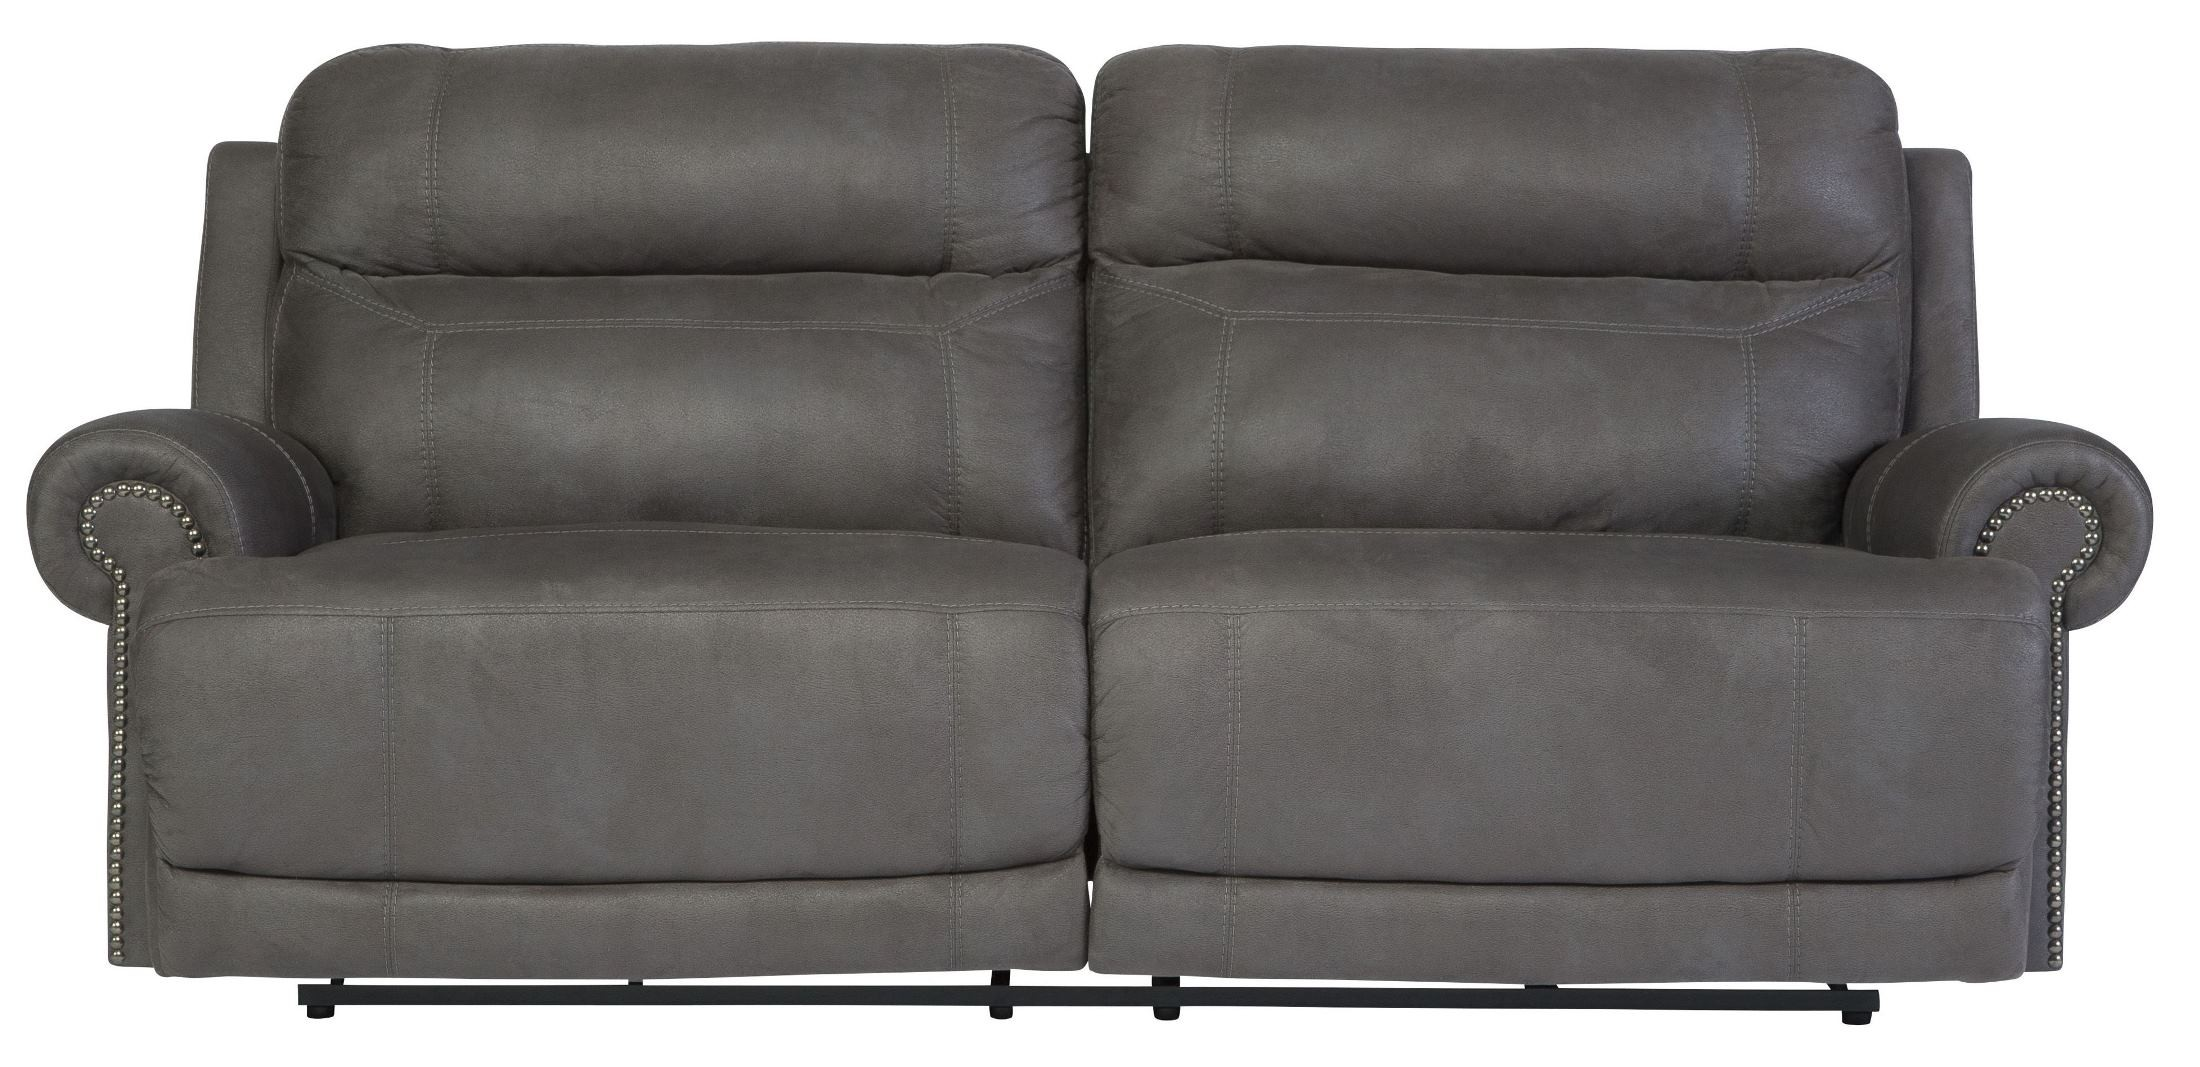 FurnitureETC | Furniture & More Austere Gray Power ...